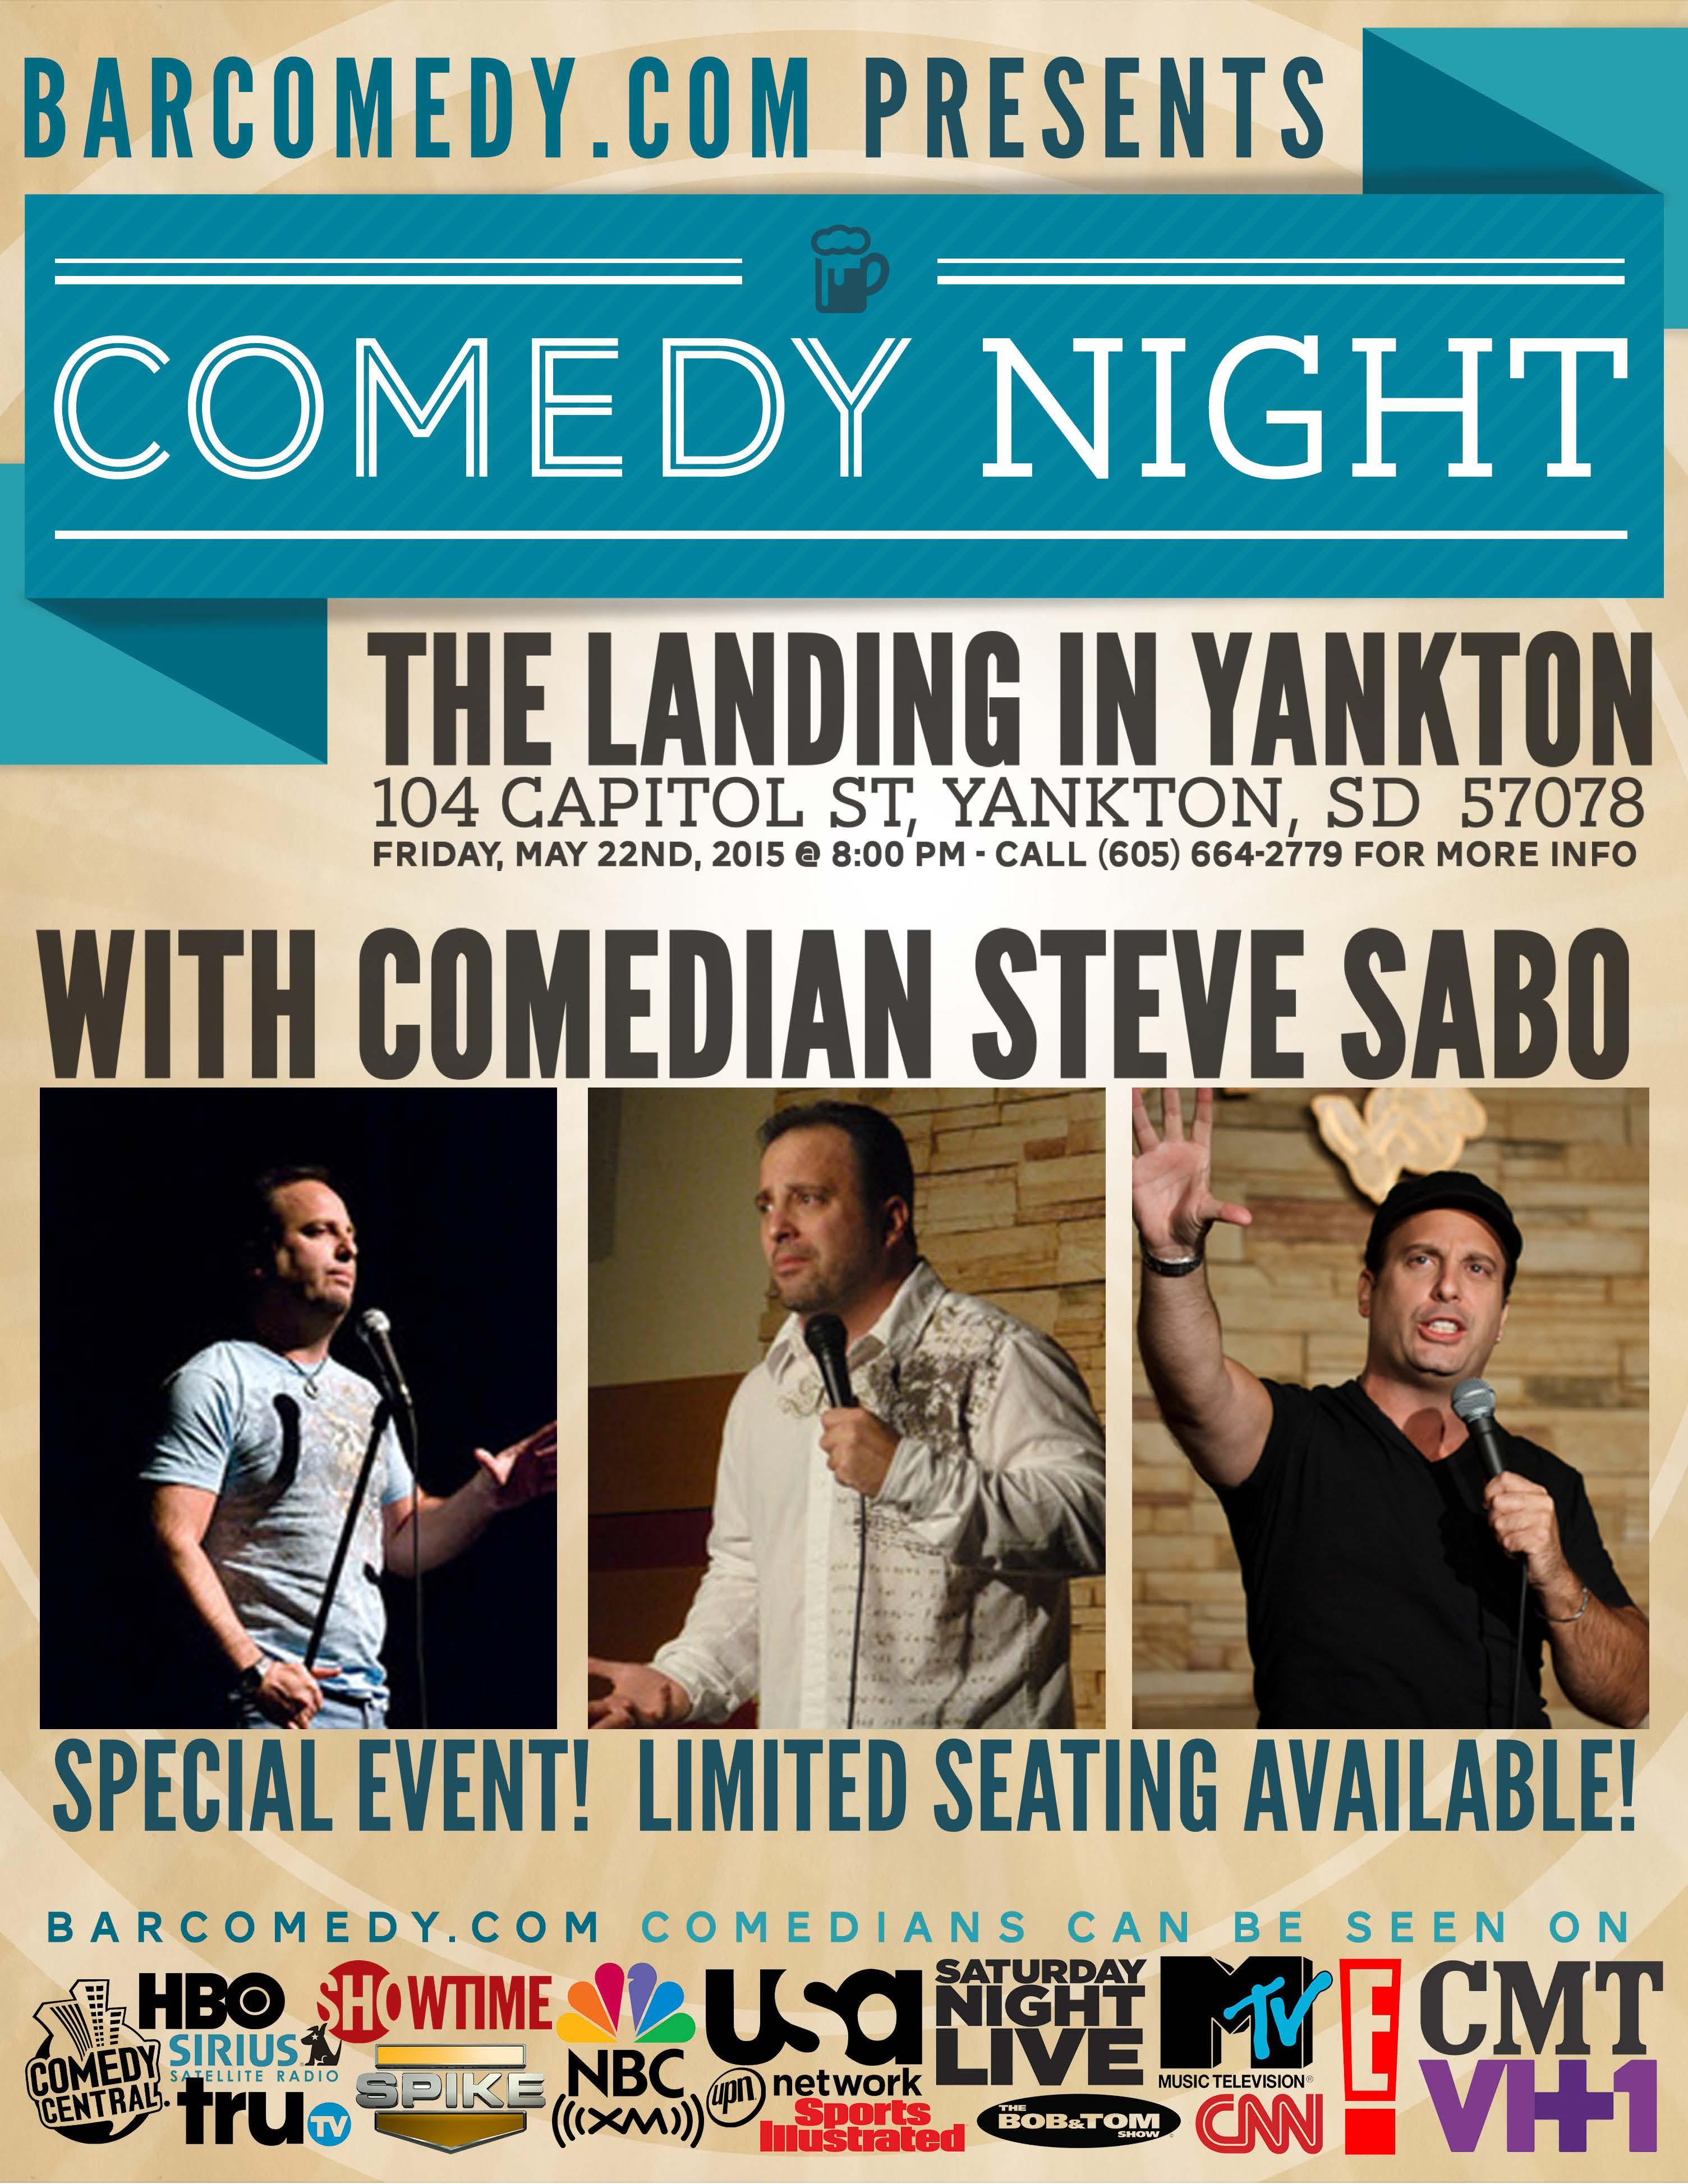 Comedy_steve_sabo_5-22-15